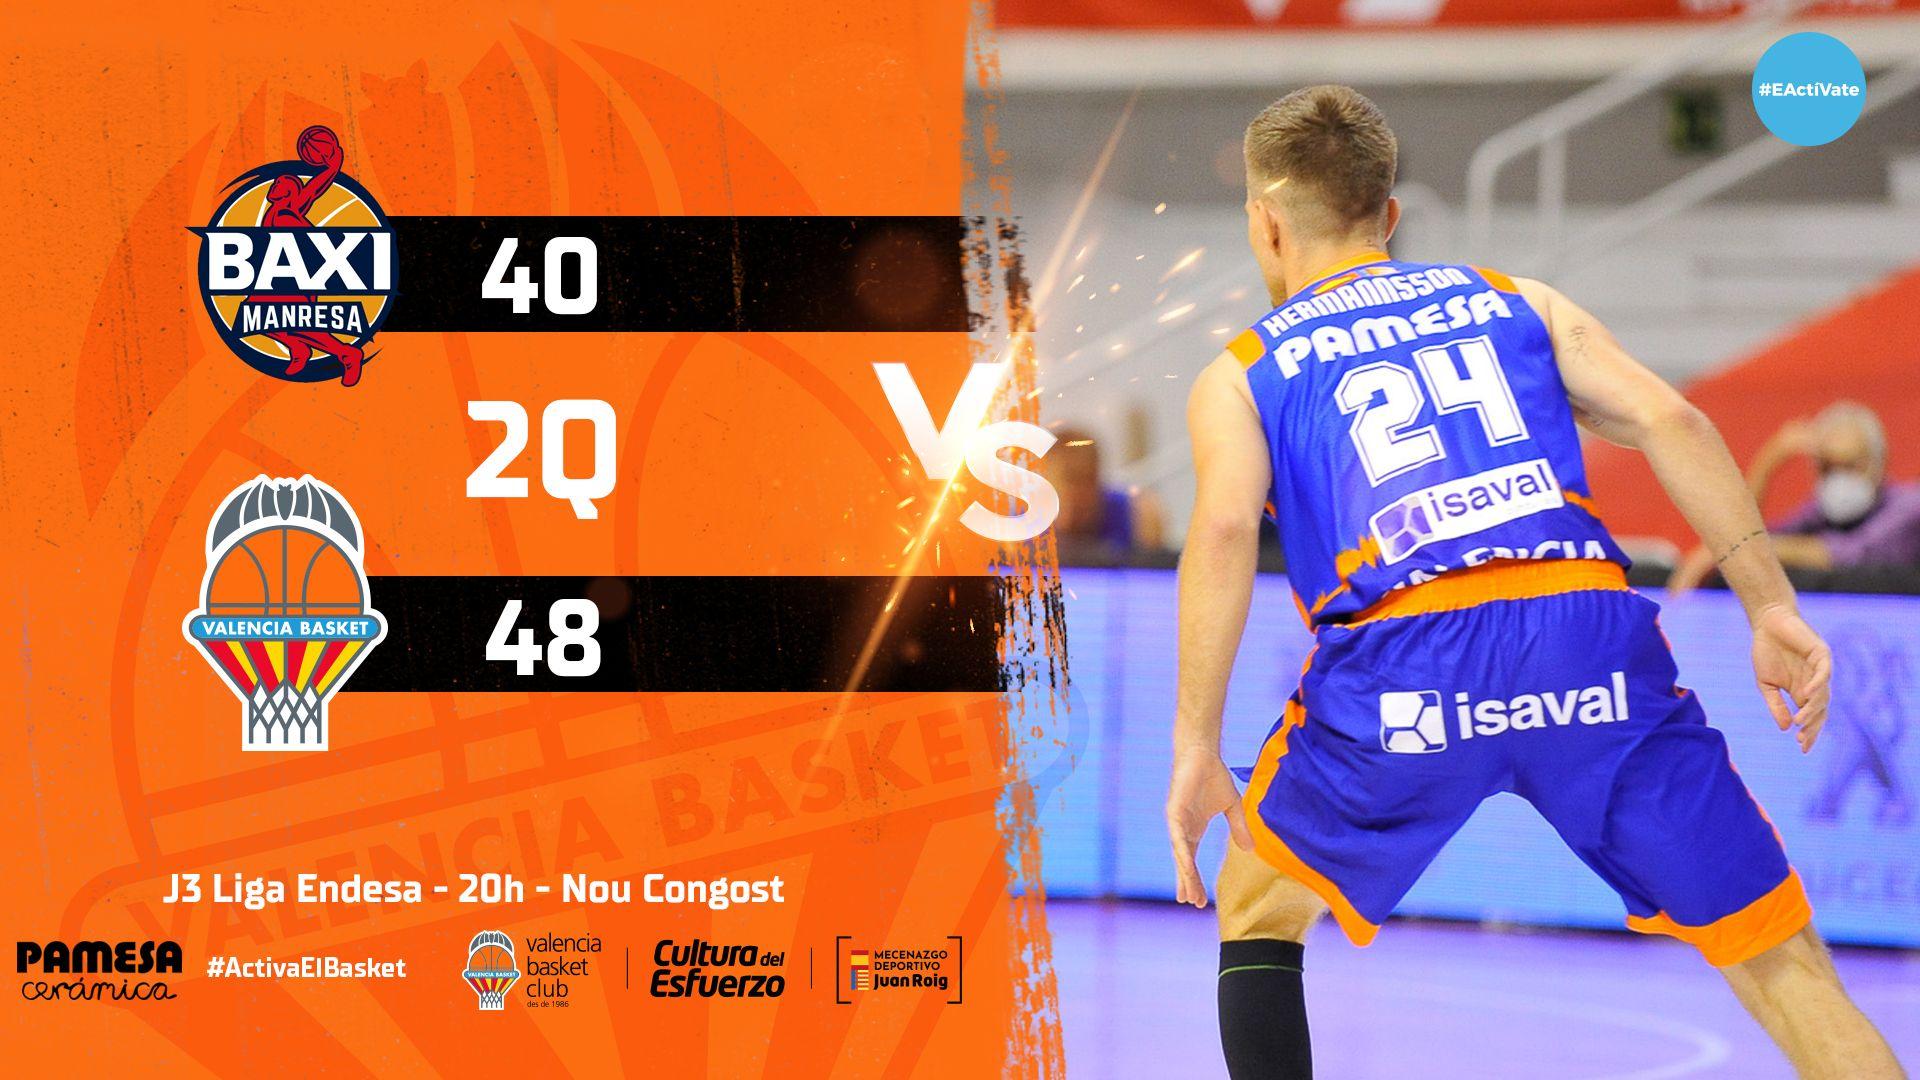 BAXI Manresa vs Valencia Basket